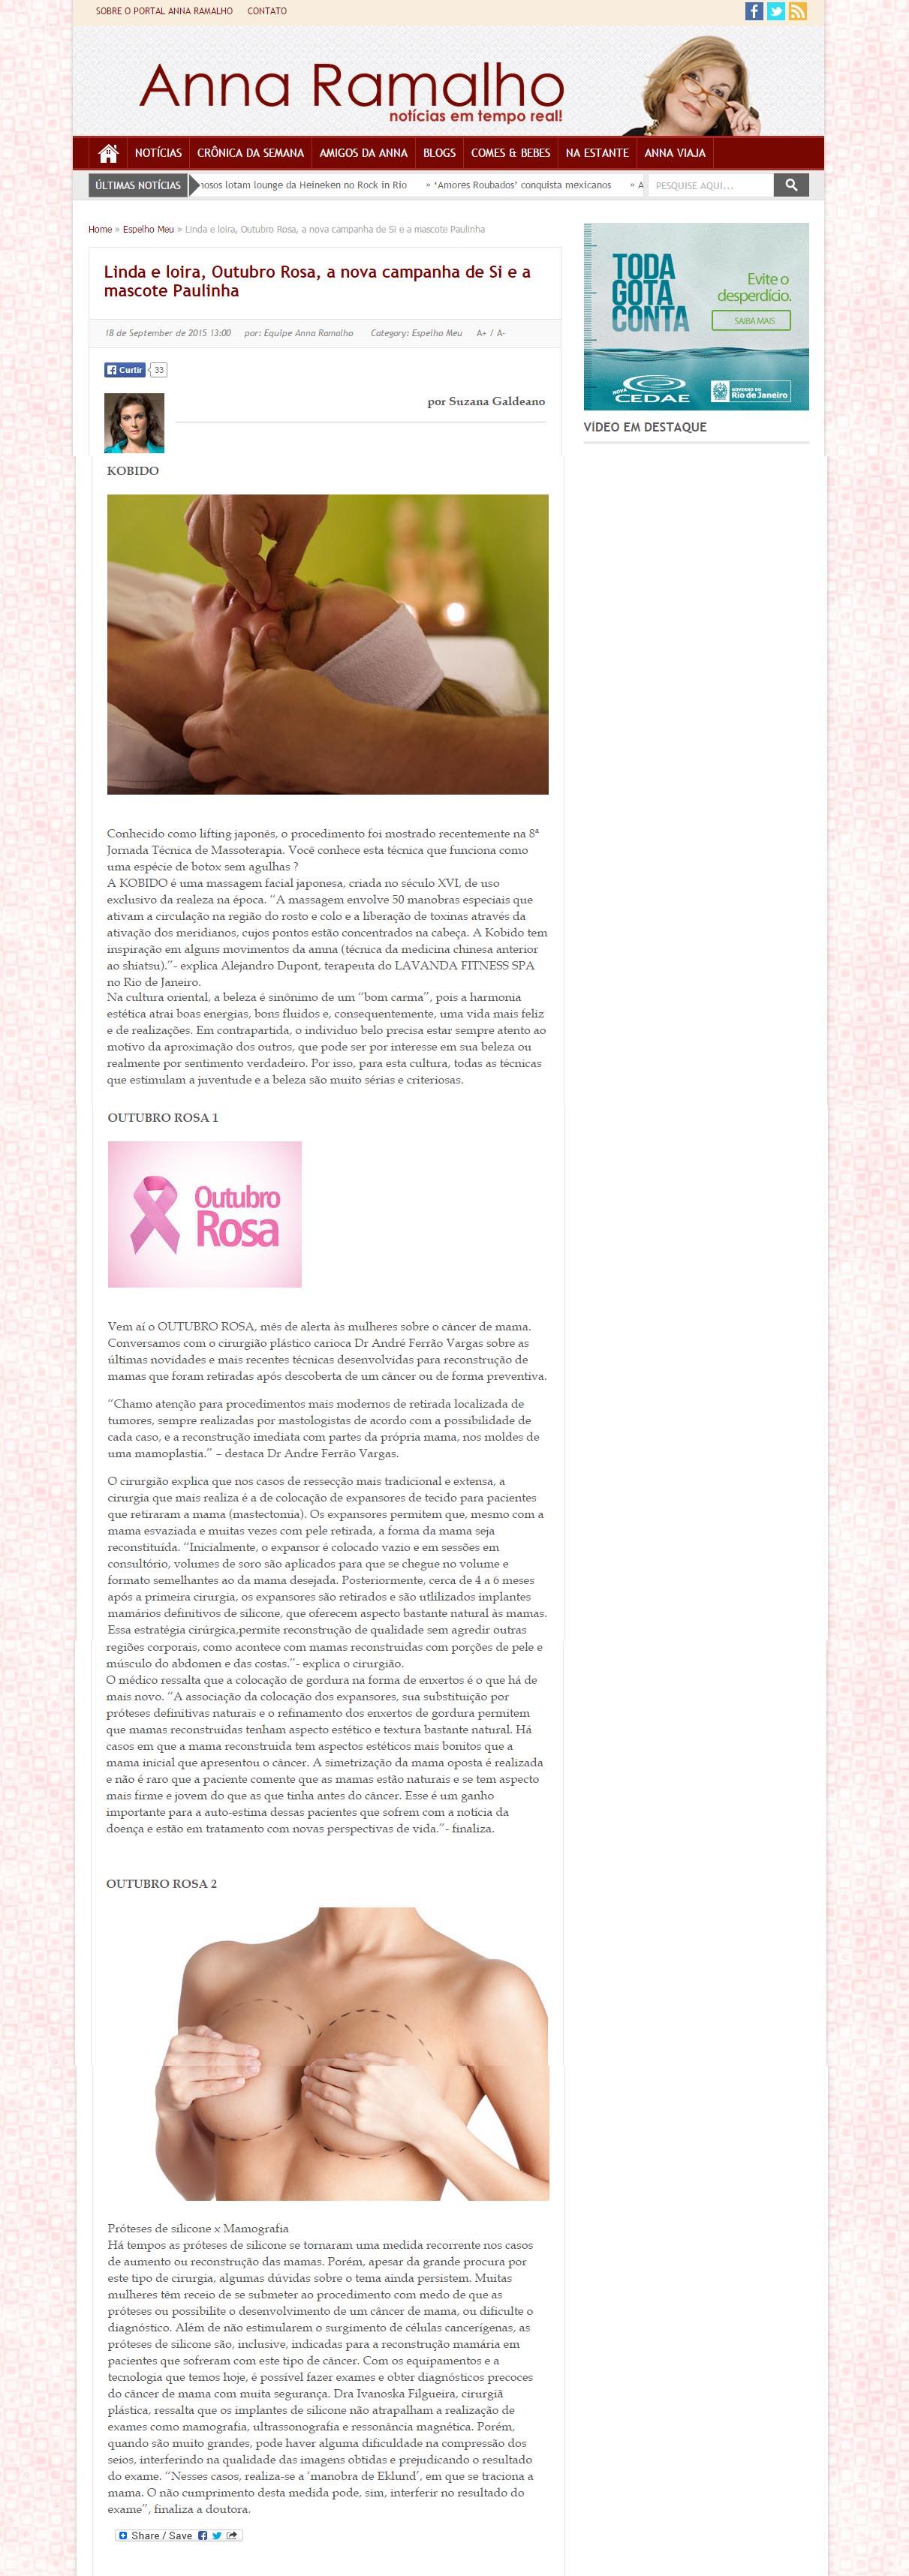 Site Ana Ramalho